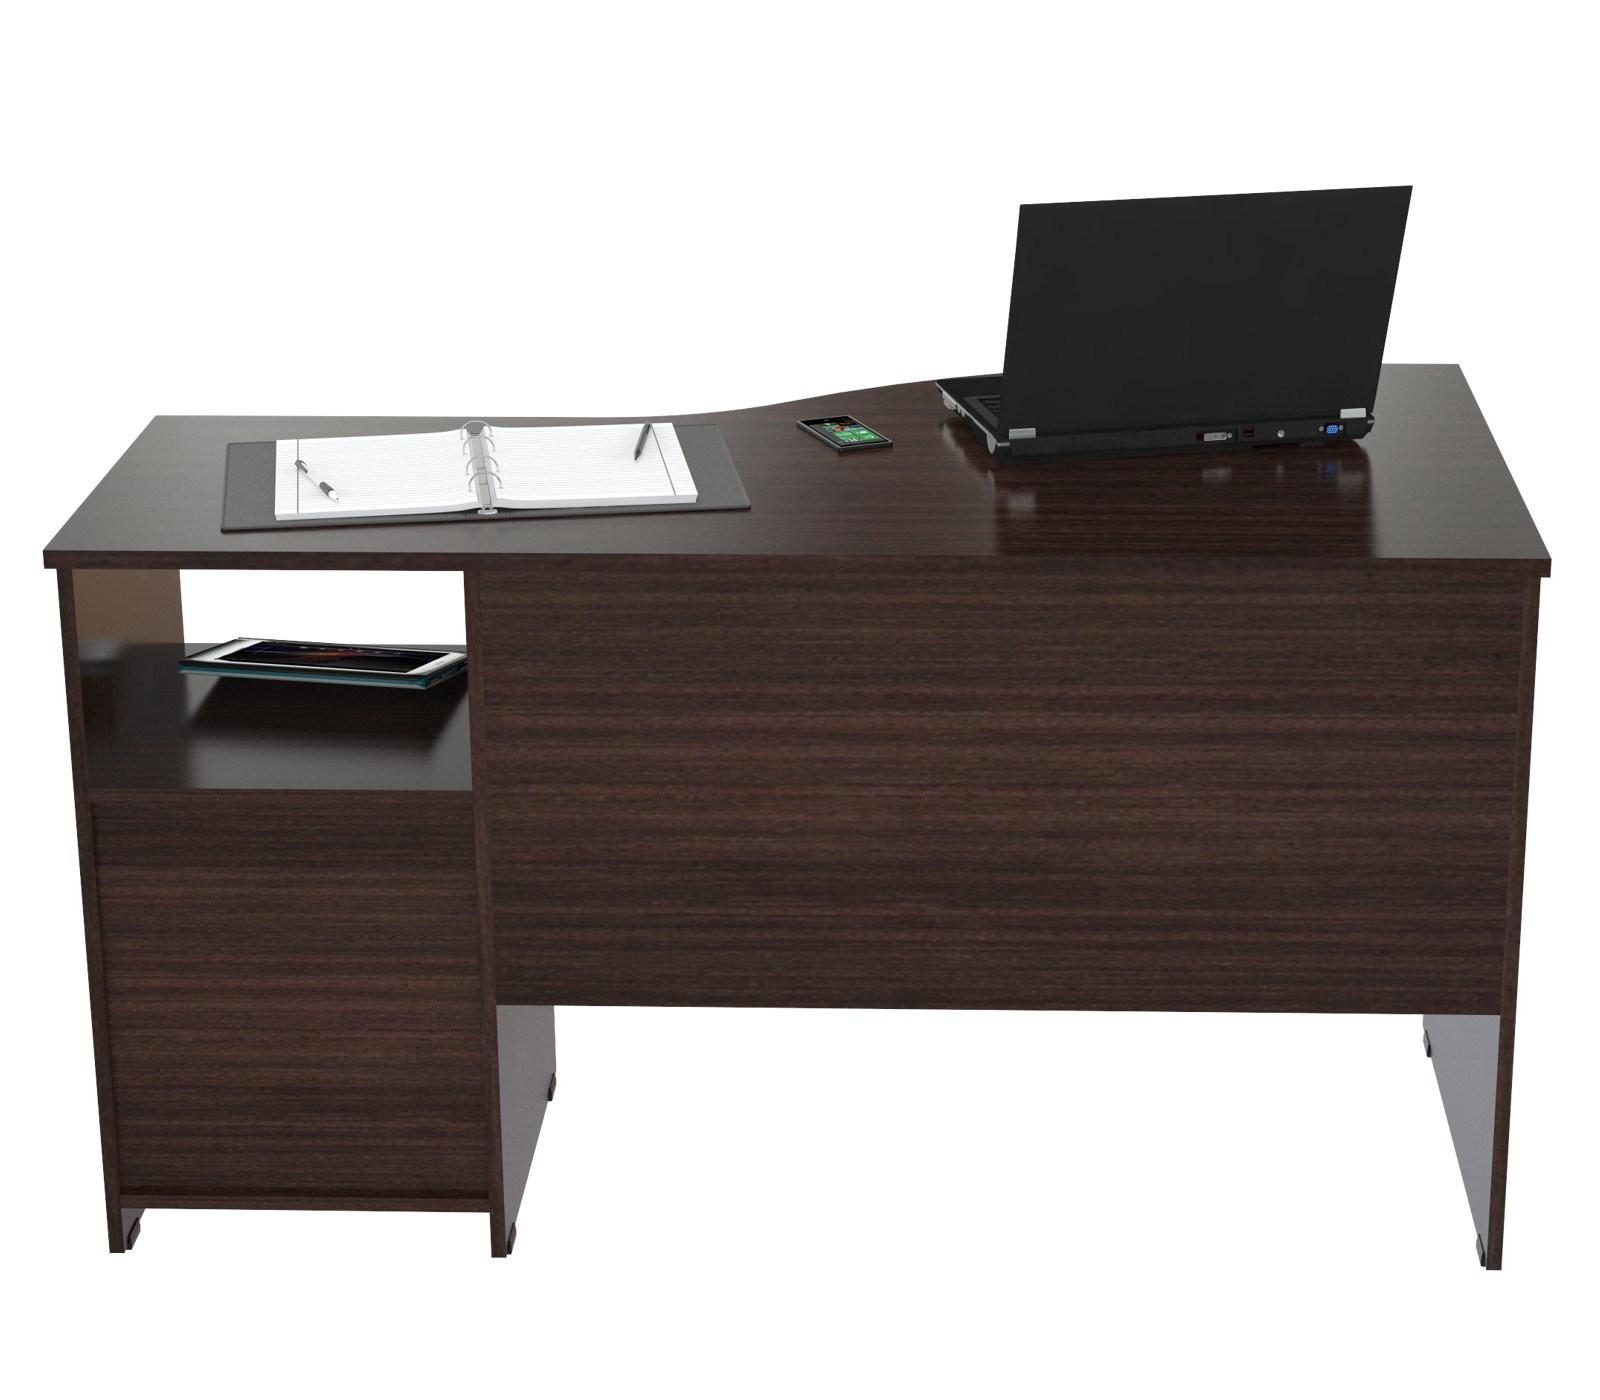 "29.5"" Espresso Melamine and Engineered Wood Curved Top Desk"